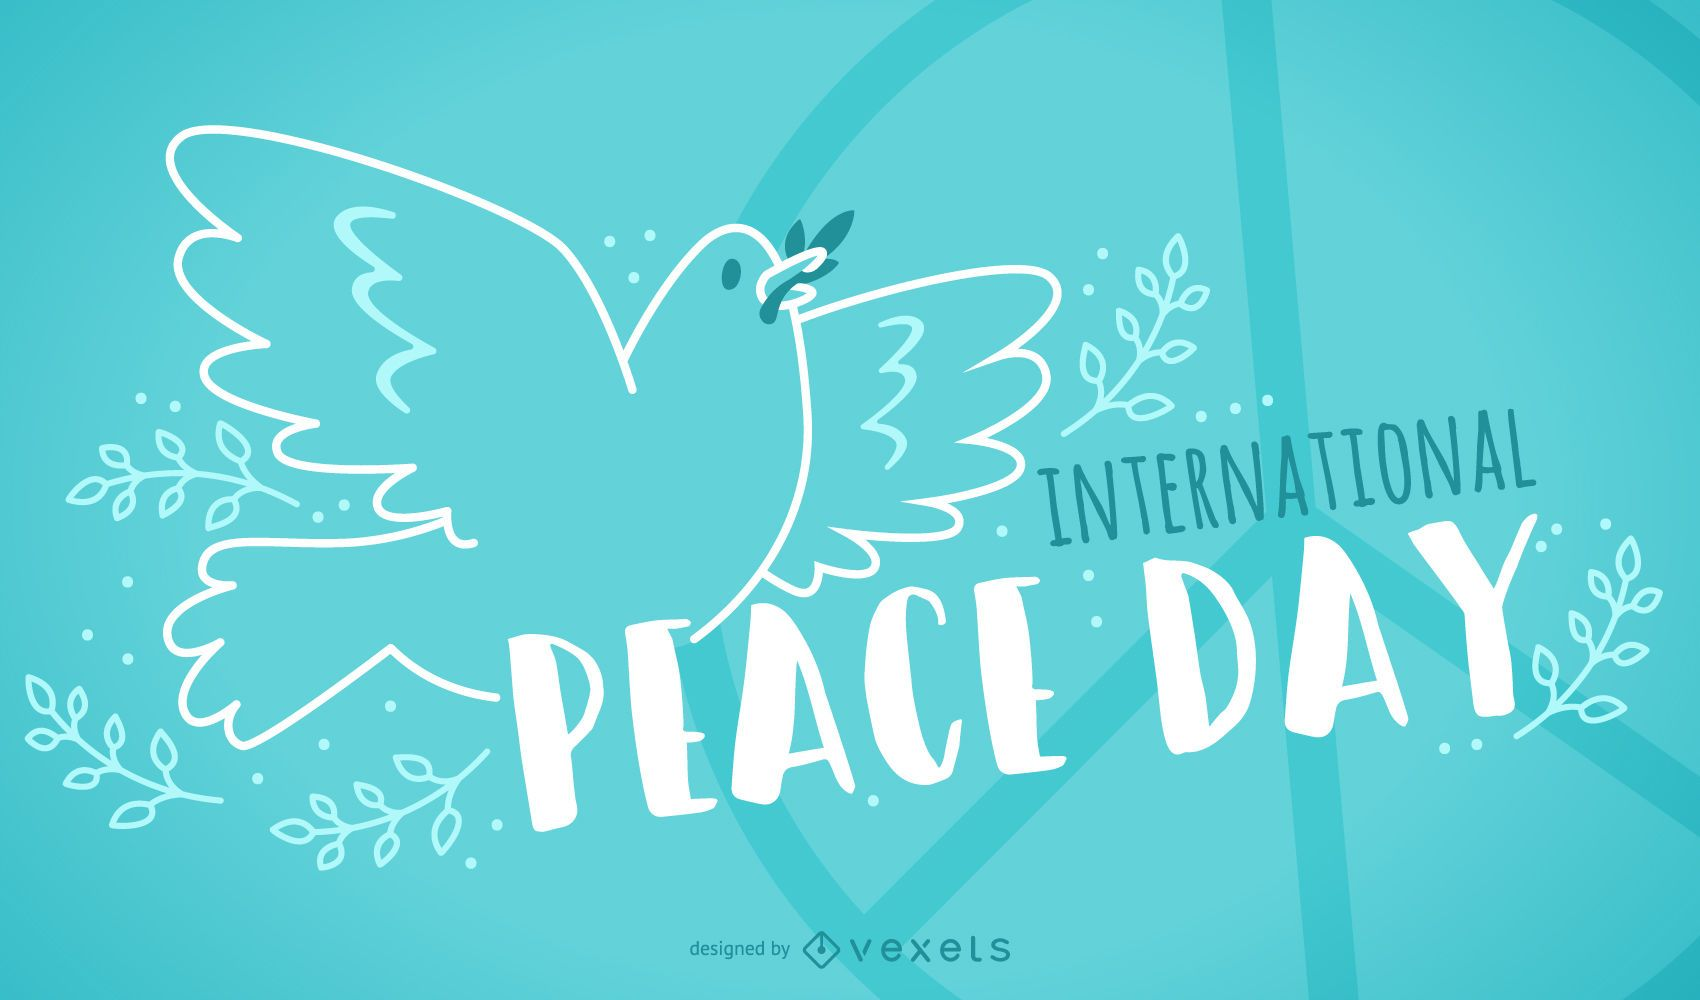 Friendly International Peace Day design